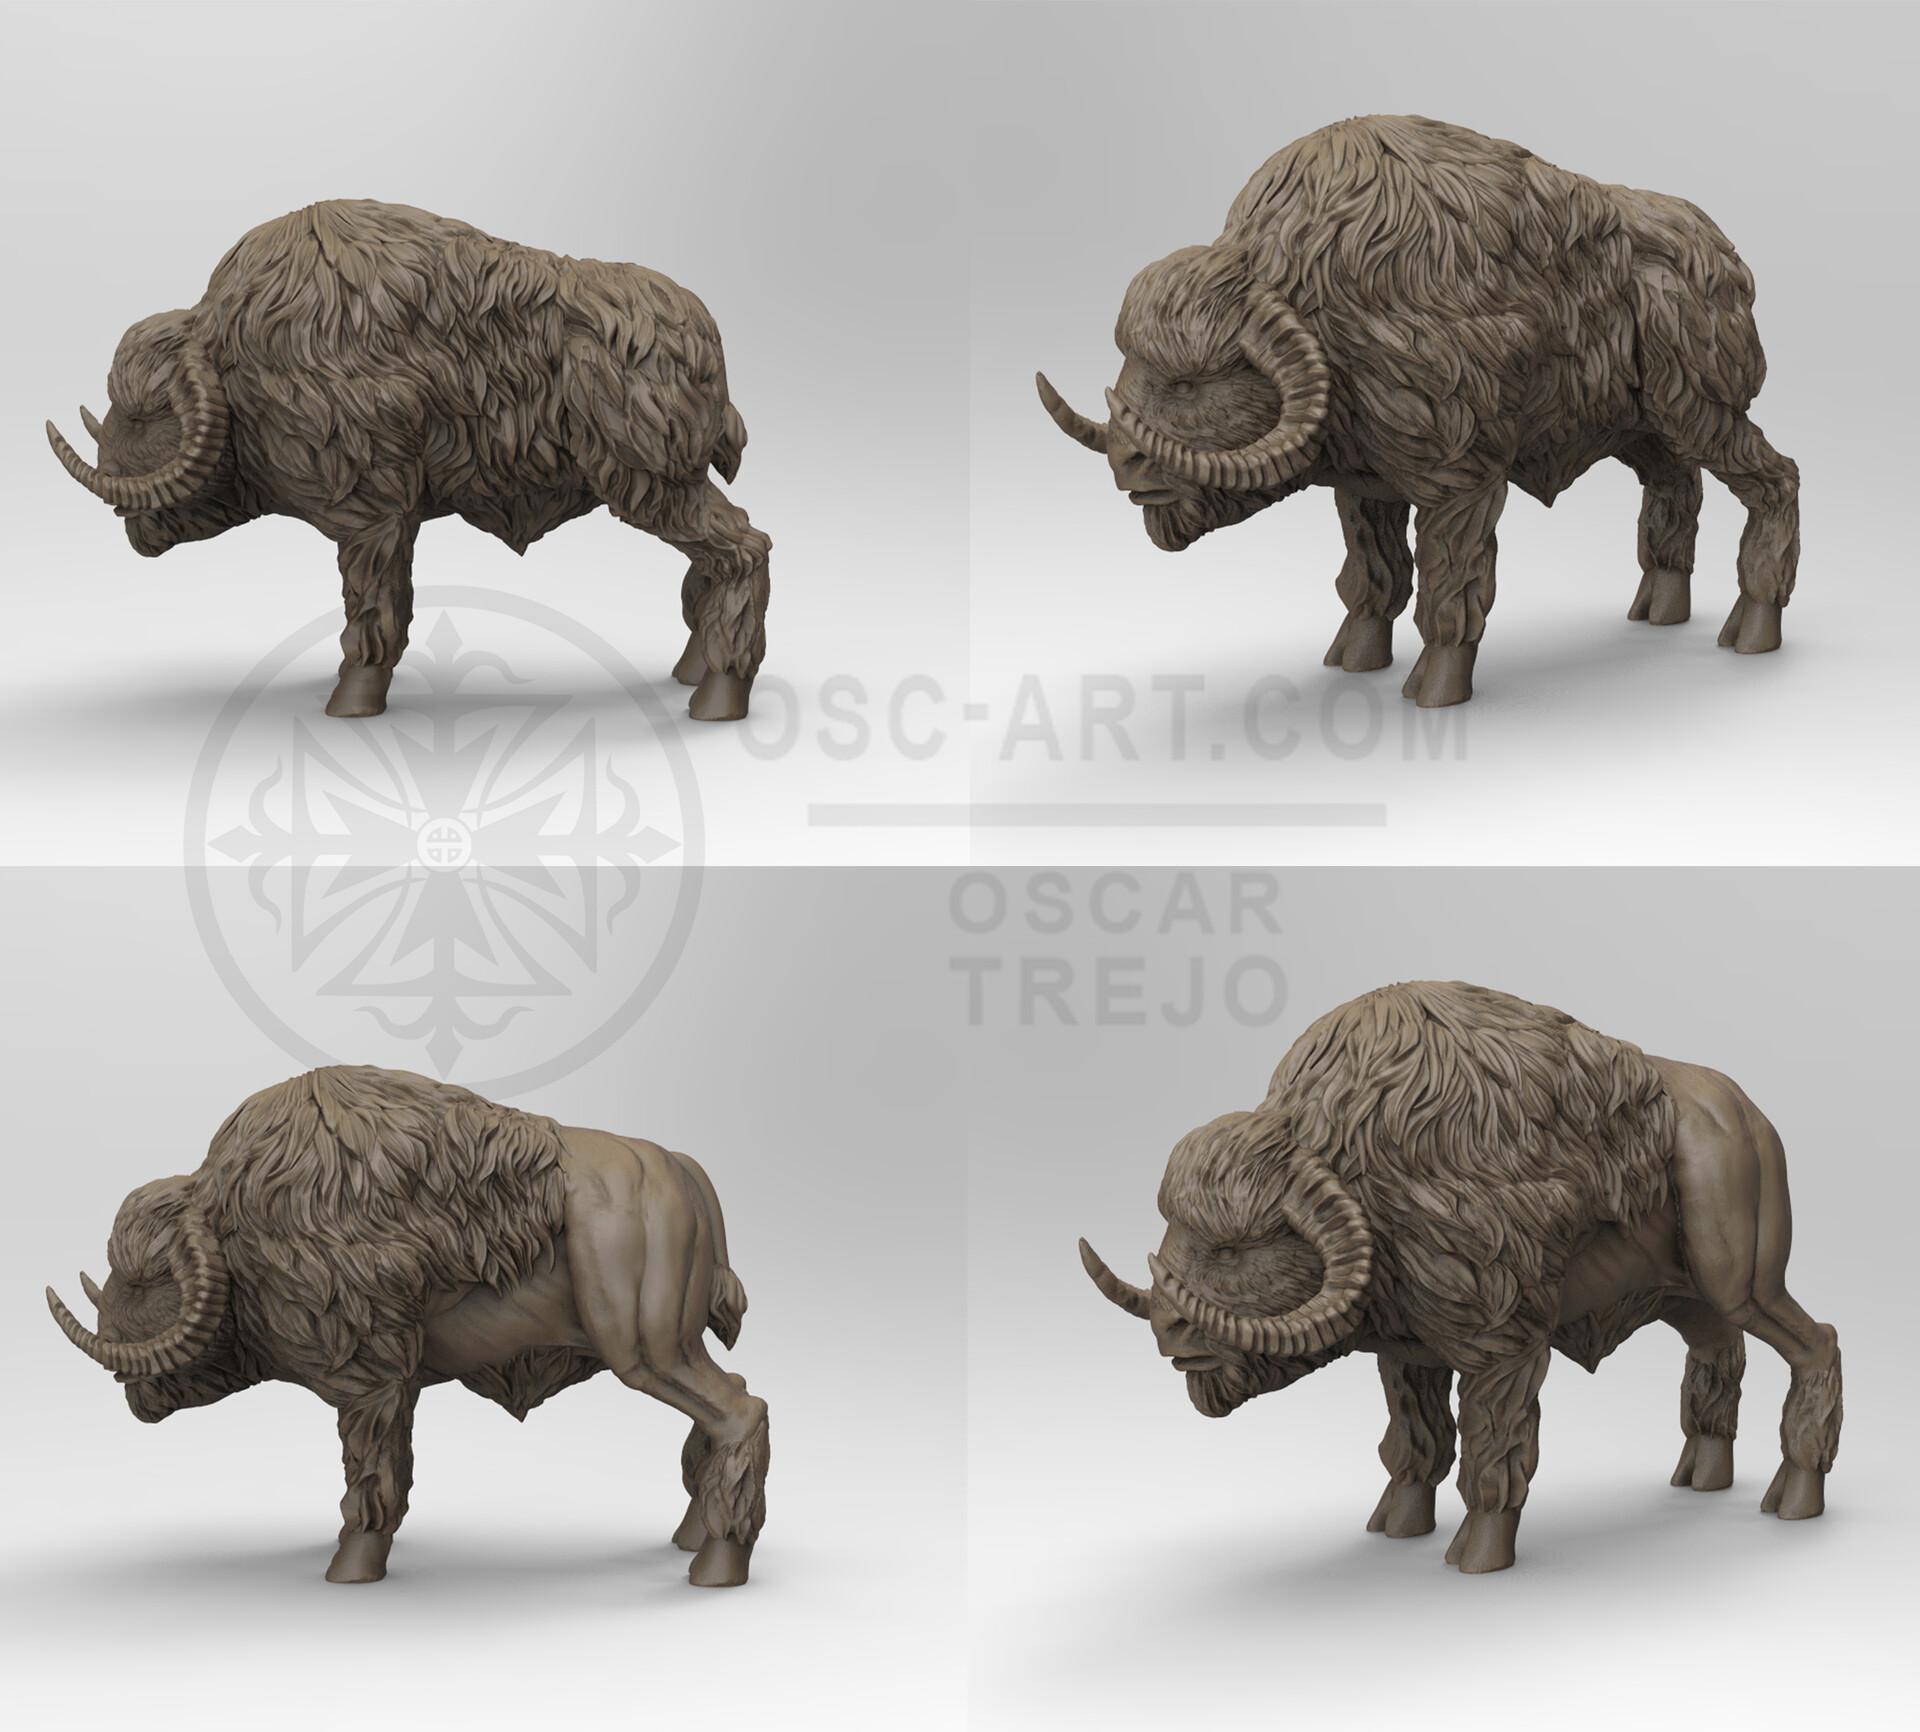 Oscar trejo buffalo2